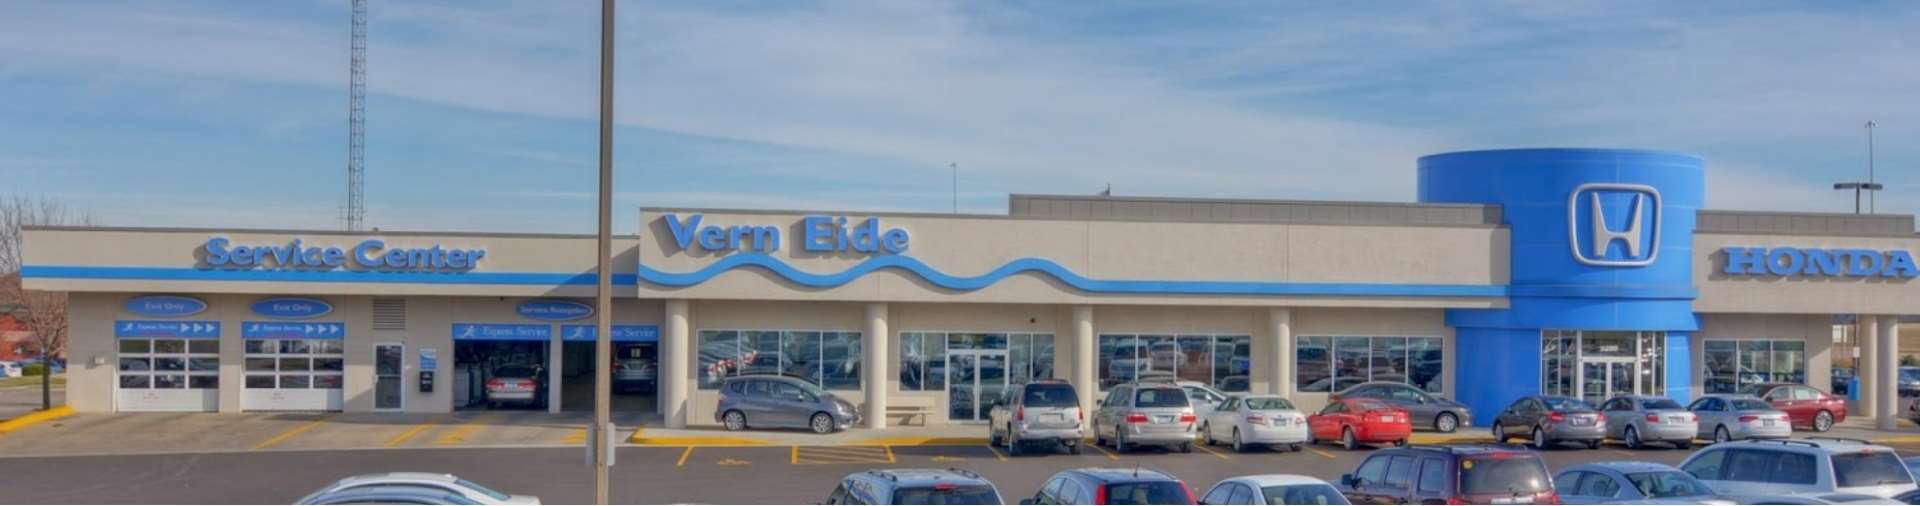 Vern Eide Honda Service Center Sioux Falls